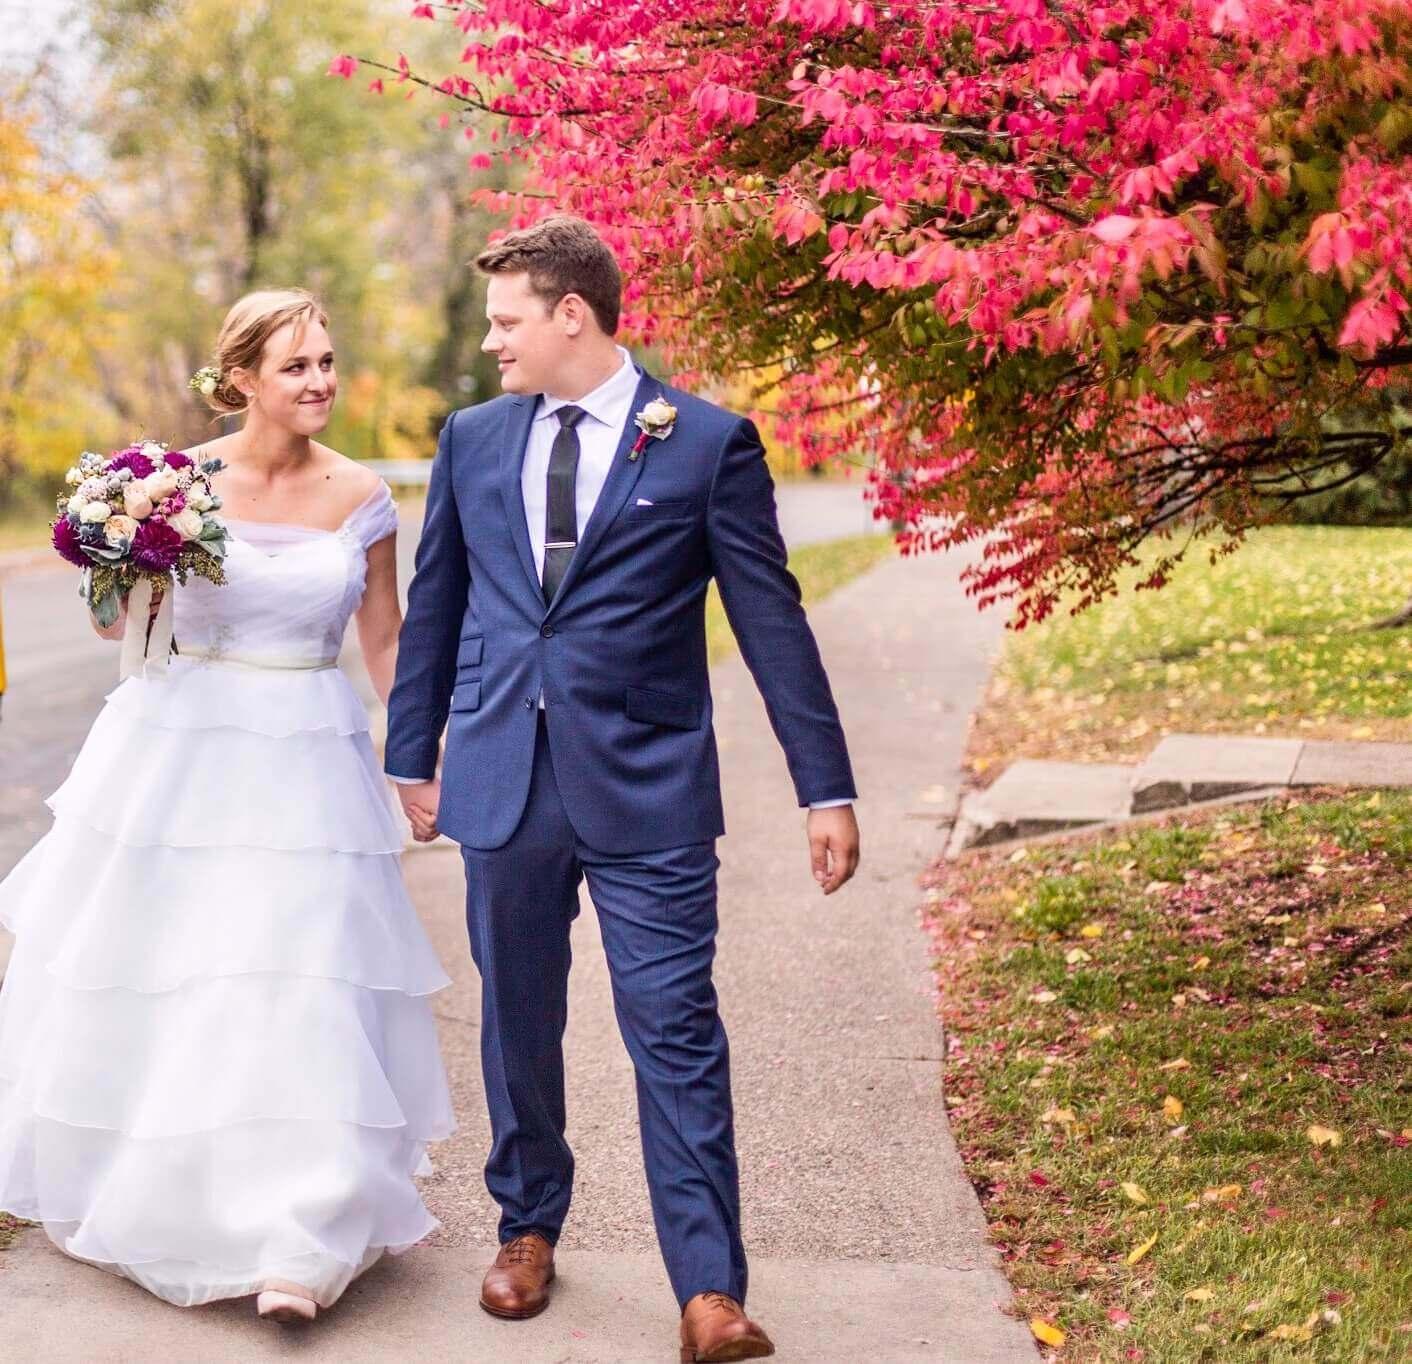 Wedding Dress Alterations Minneapolis